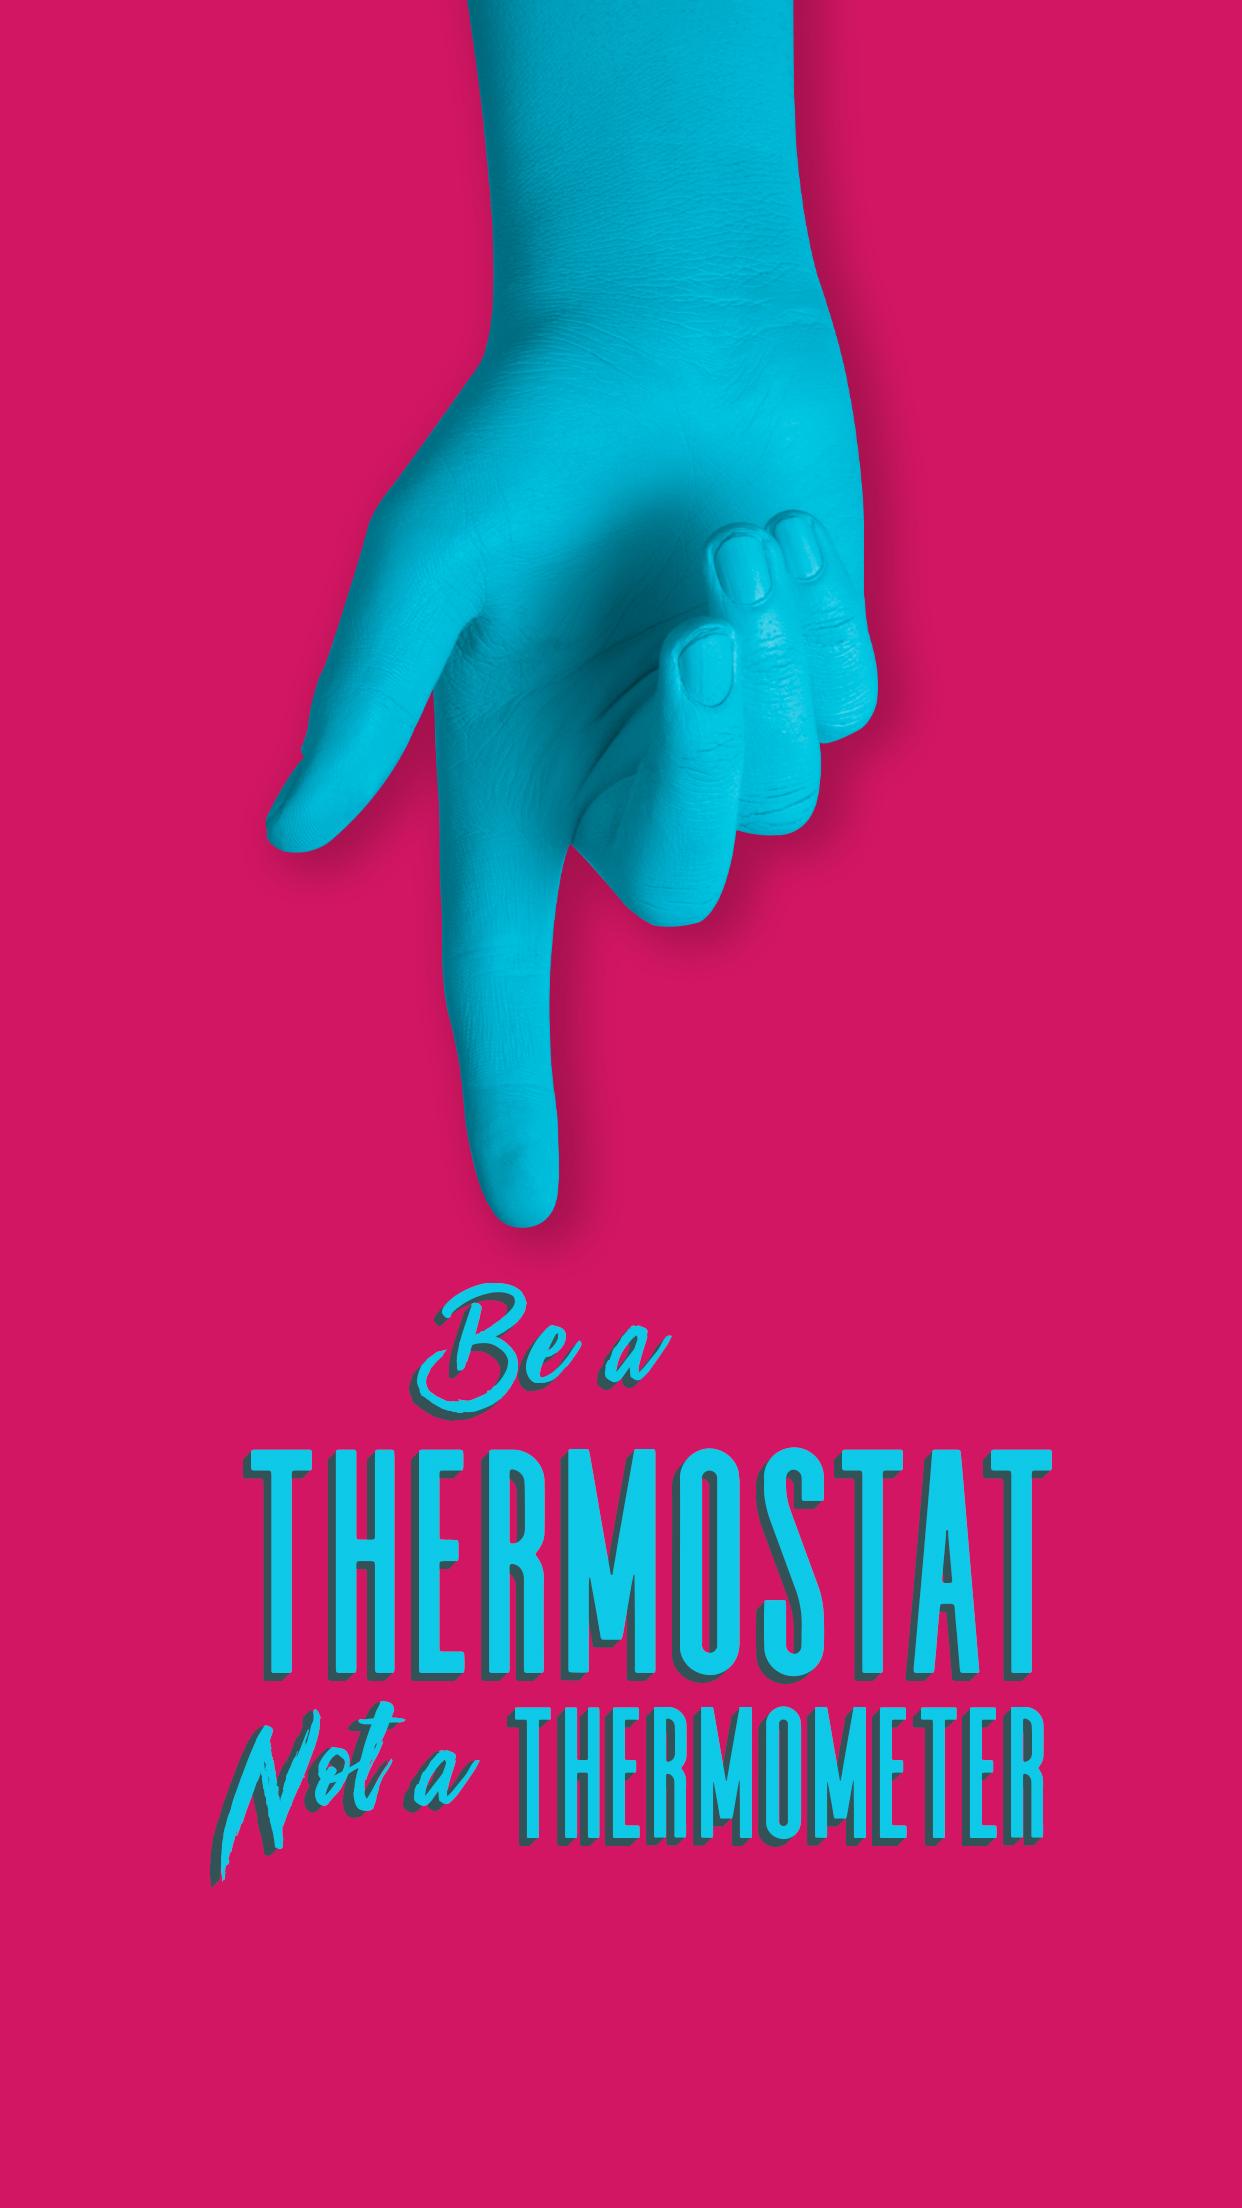 Thermostat_Wallpaper.jpg